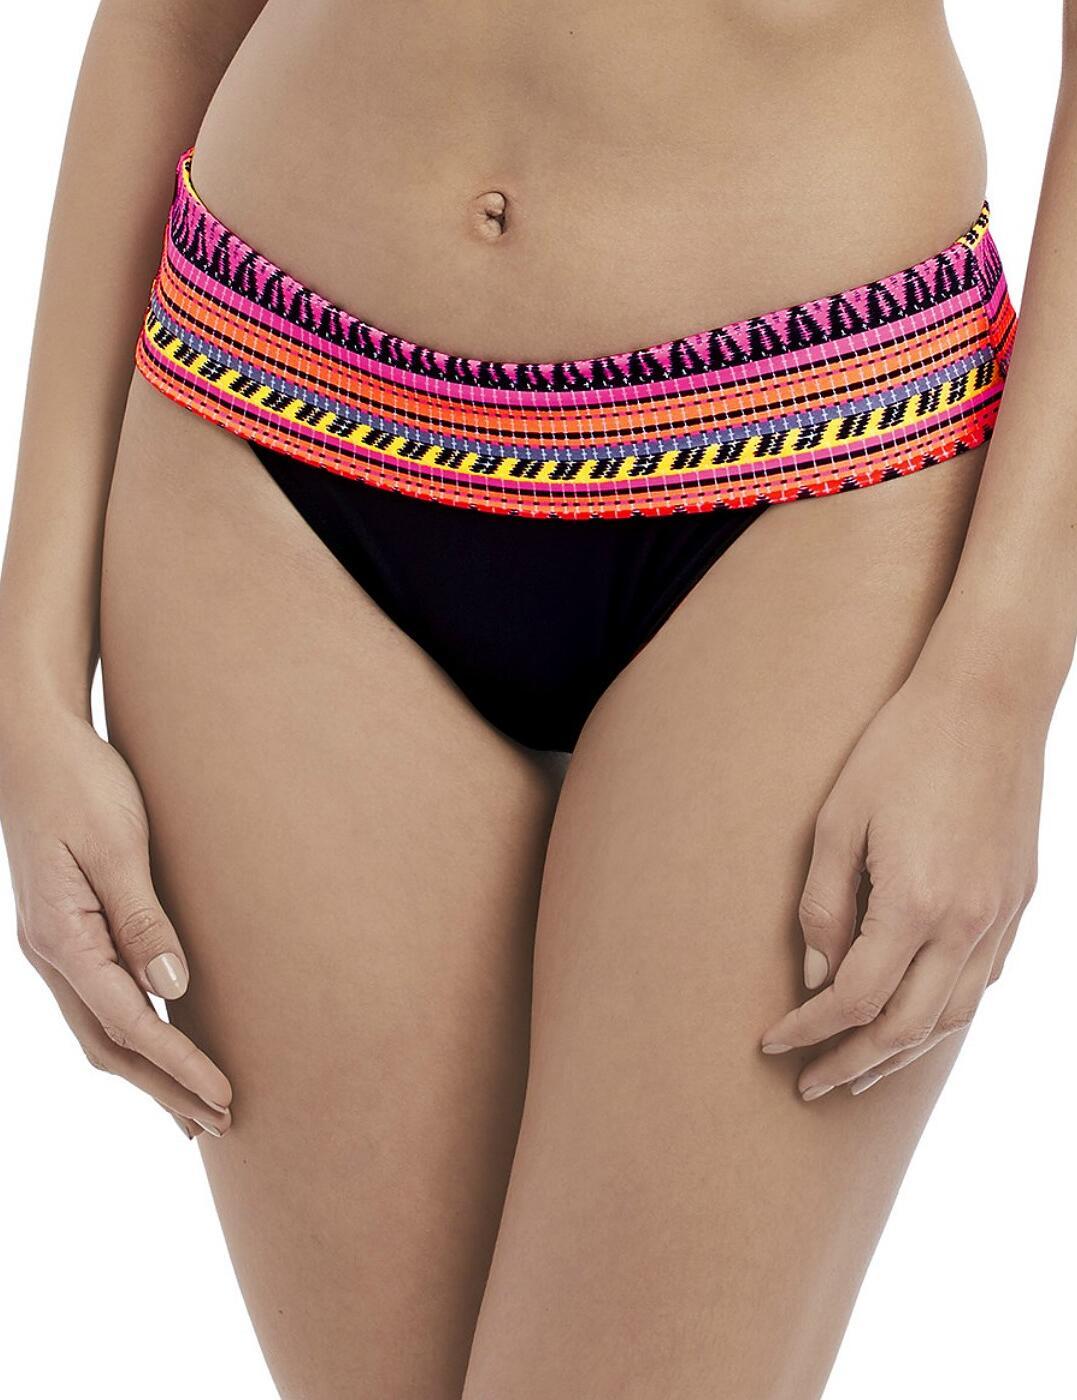 4626 Freya Way Out West Classic Fold Bikini Brief - 4626 Sunset